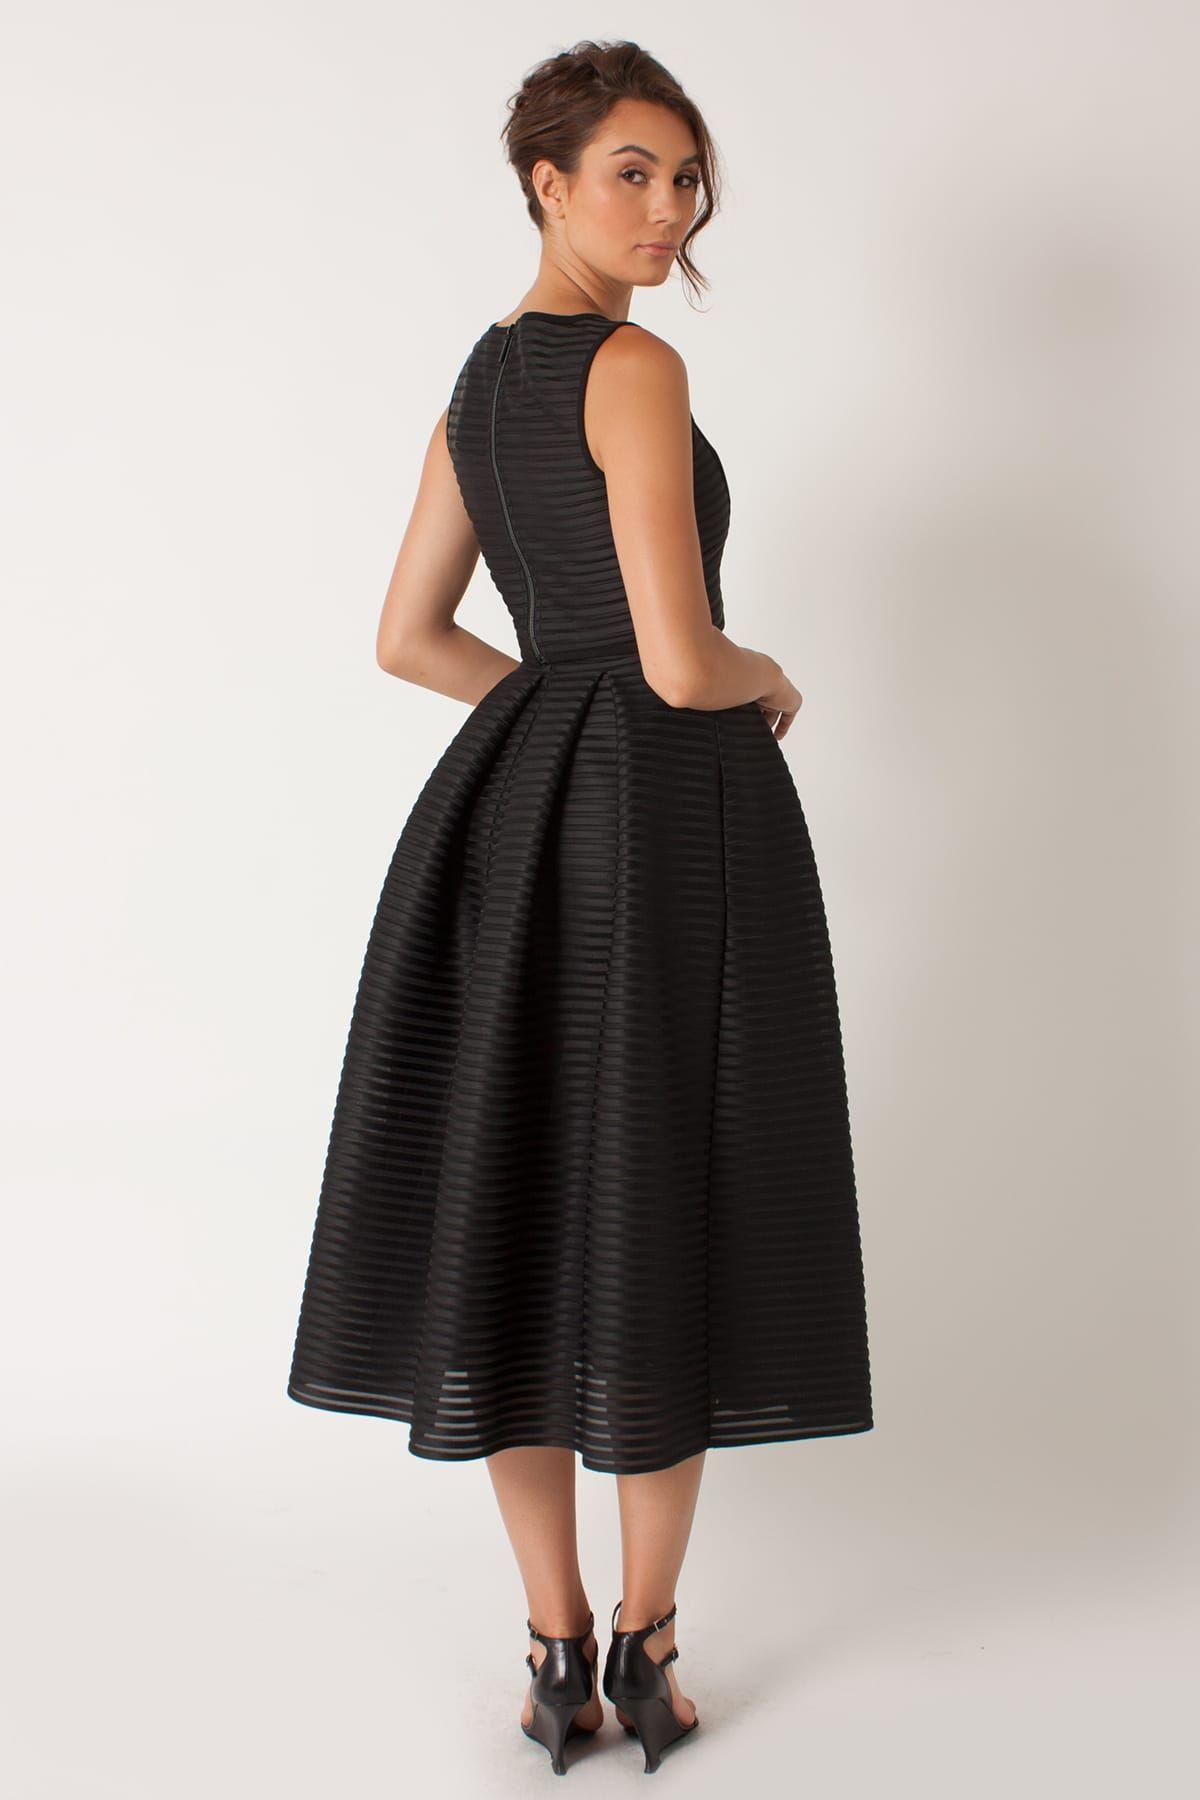 Acadia 2-Piece Cocktail Dress